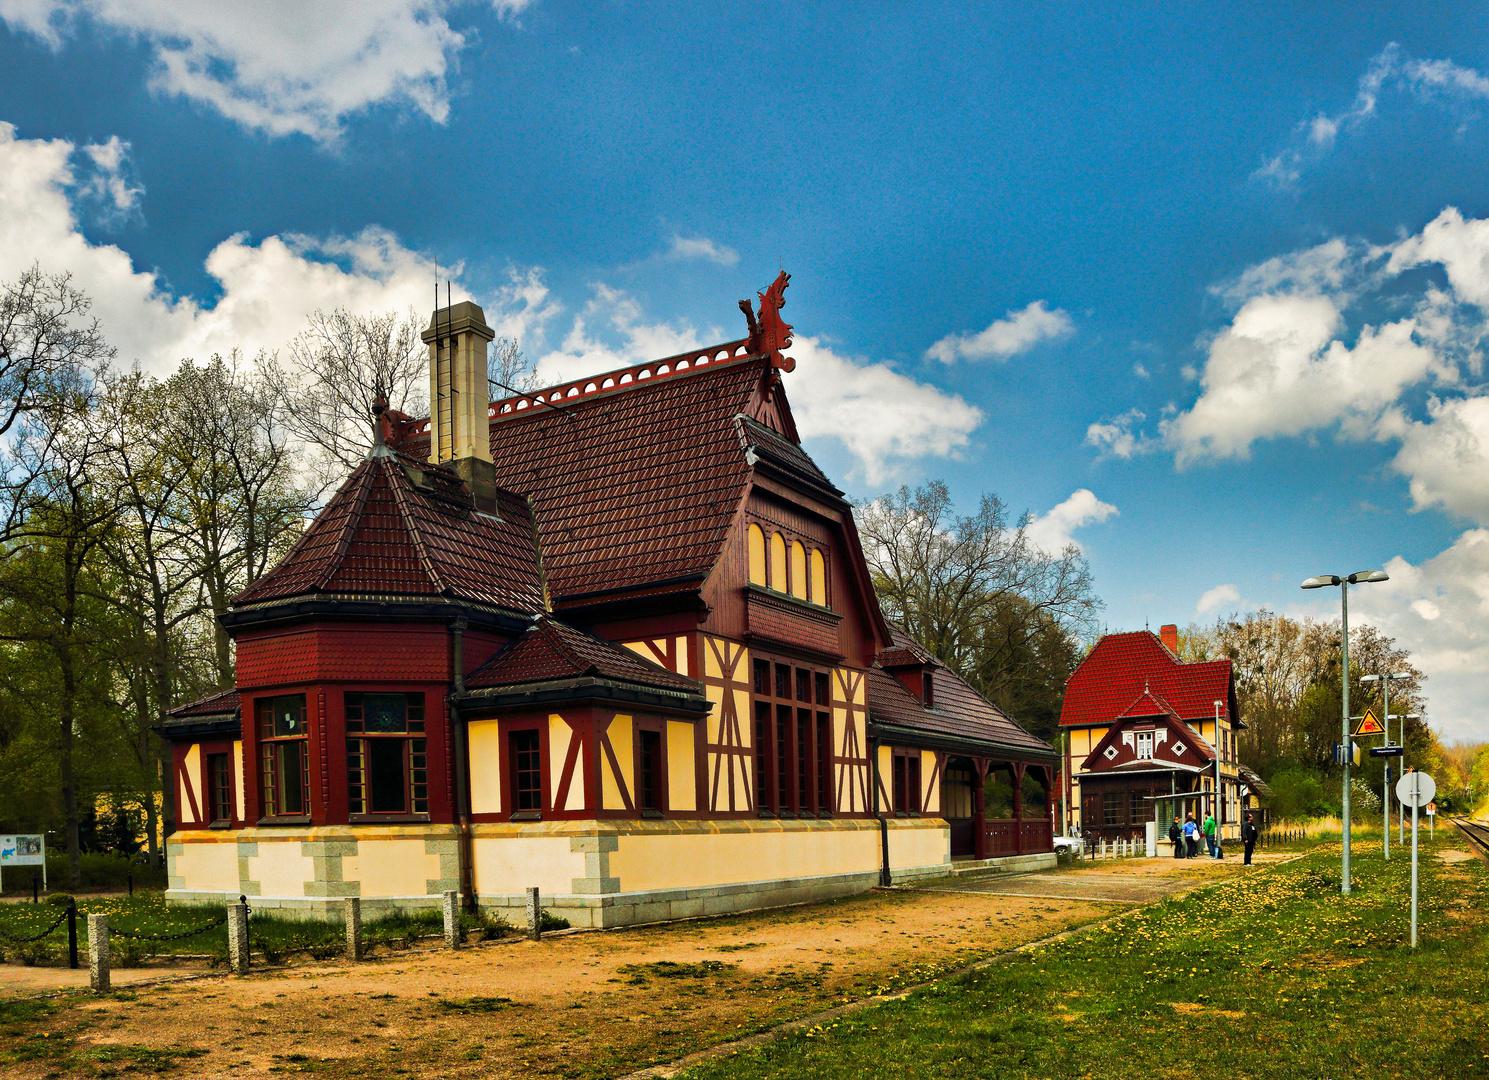 Kaiserbahnhof Werbellinsee